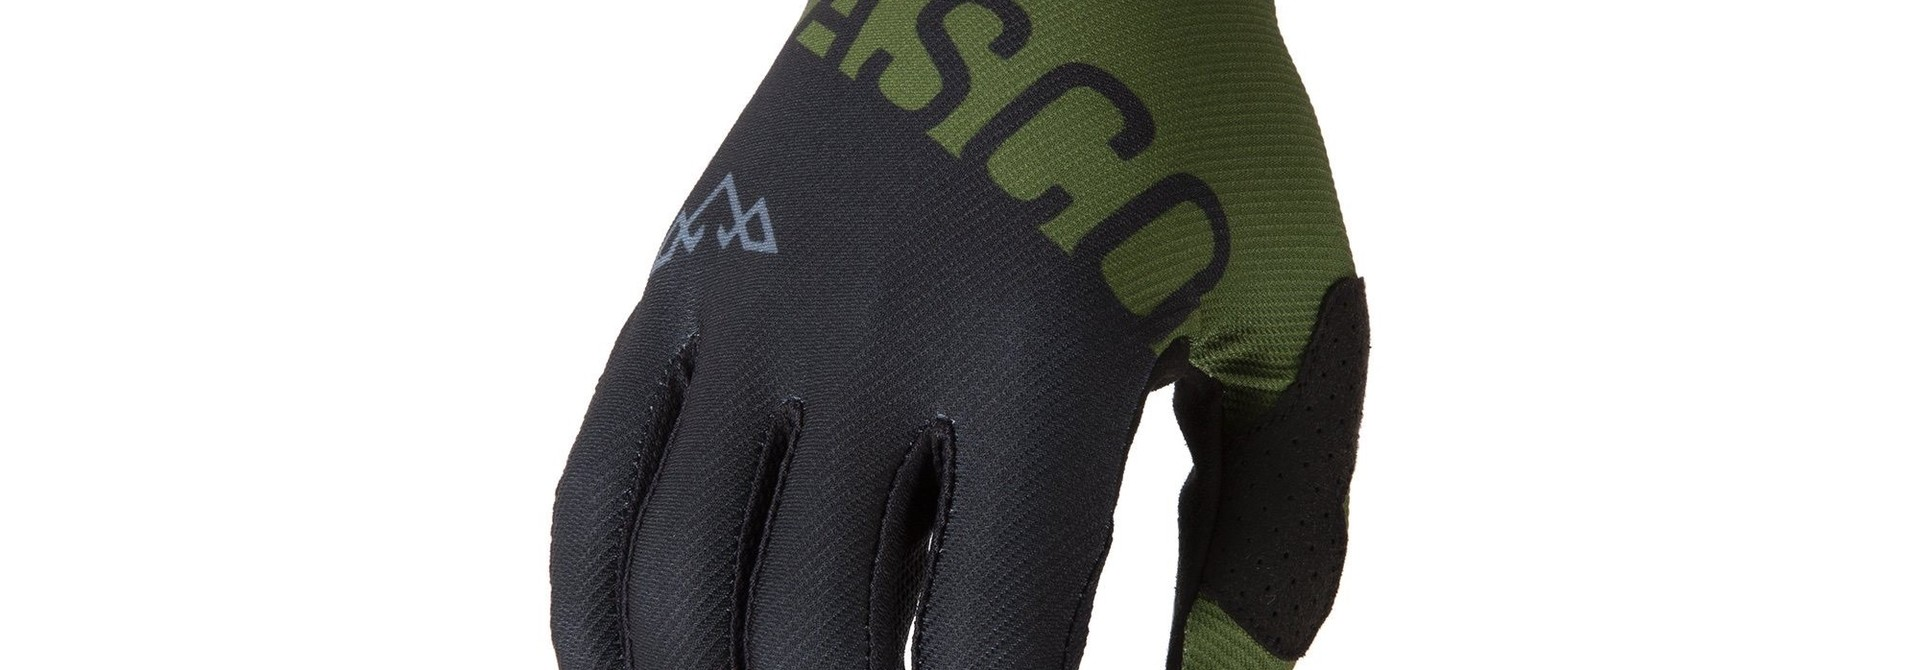 Split Double Digits MTB Gloves (Olive)